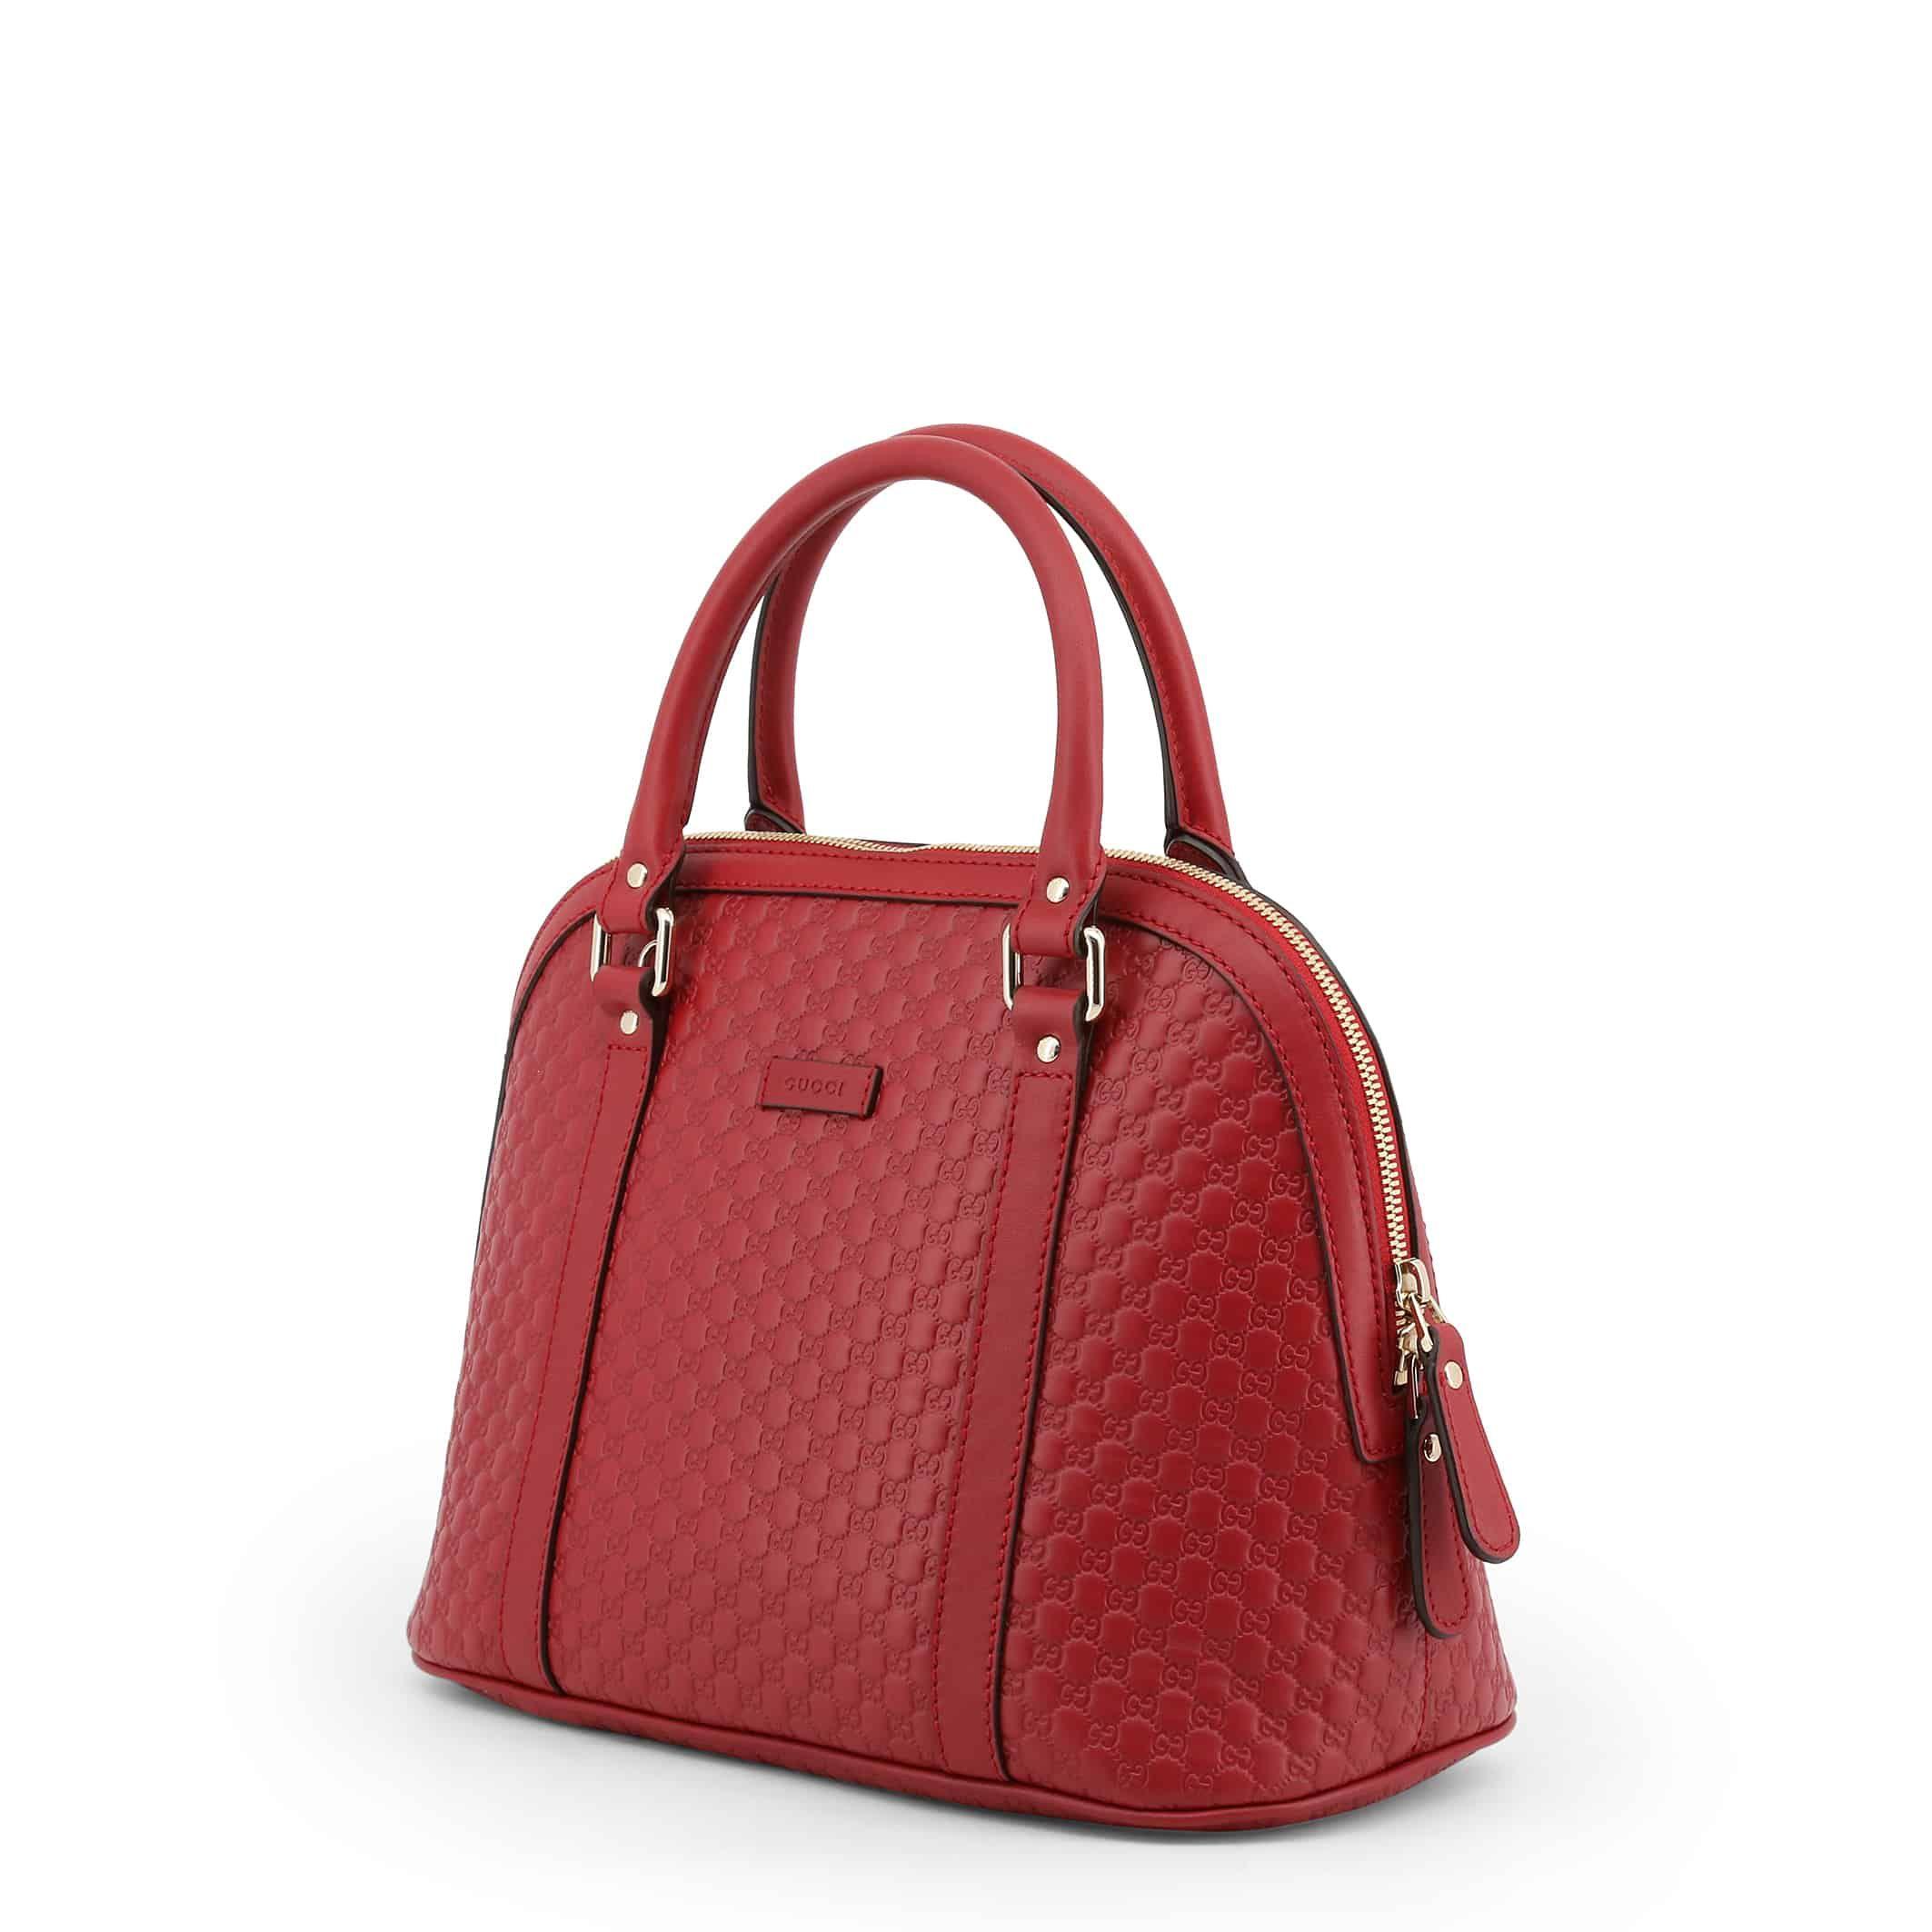 Gucci – 449663_BMJ1G